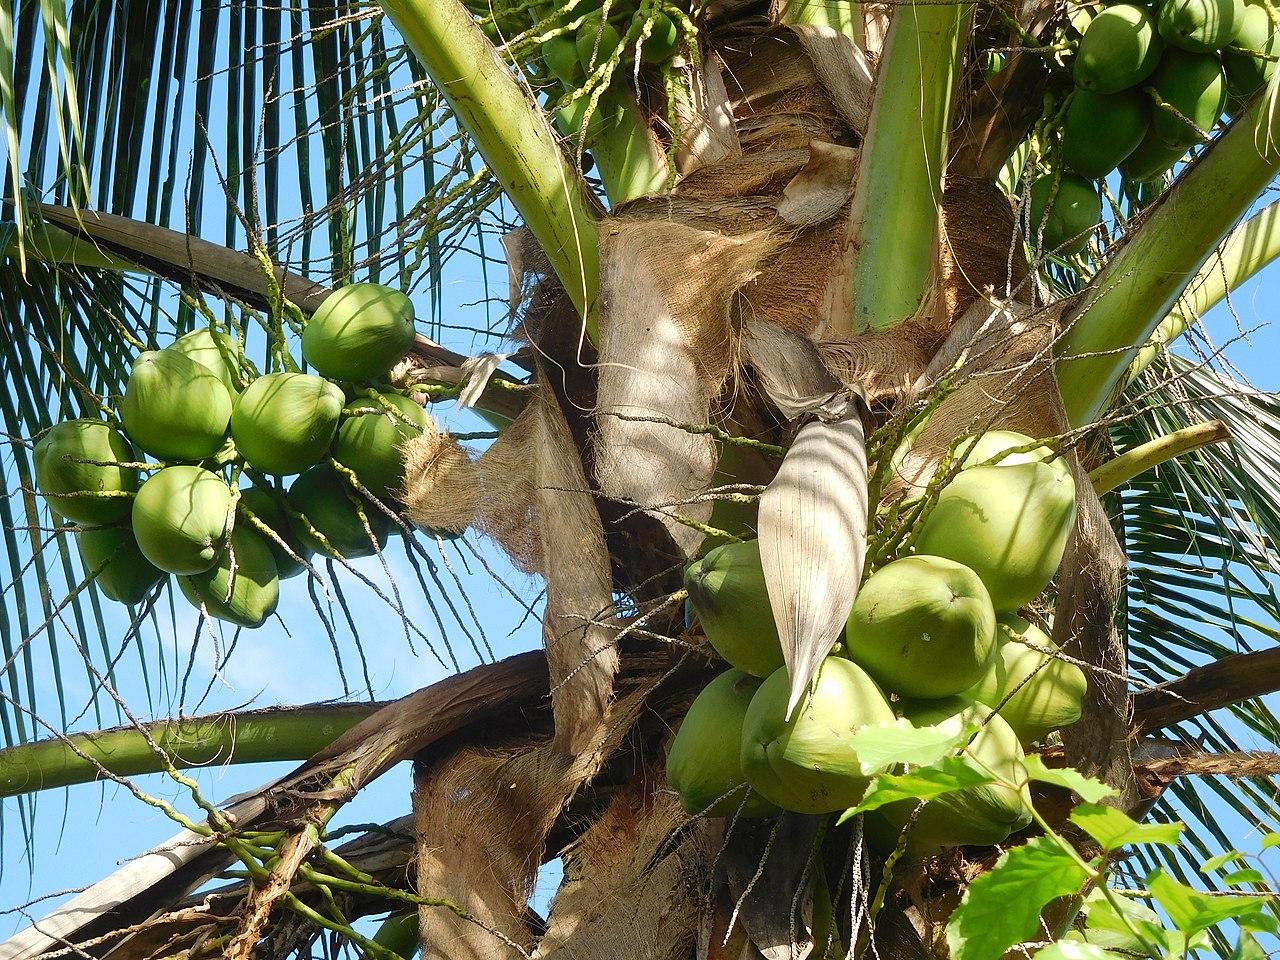 File:Cocos nucifera (Arecaceae).jpg - Wikimedia Commons